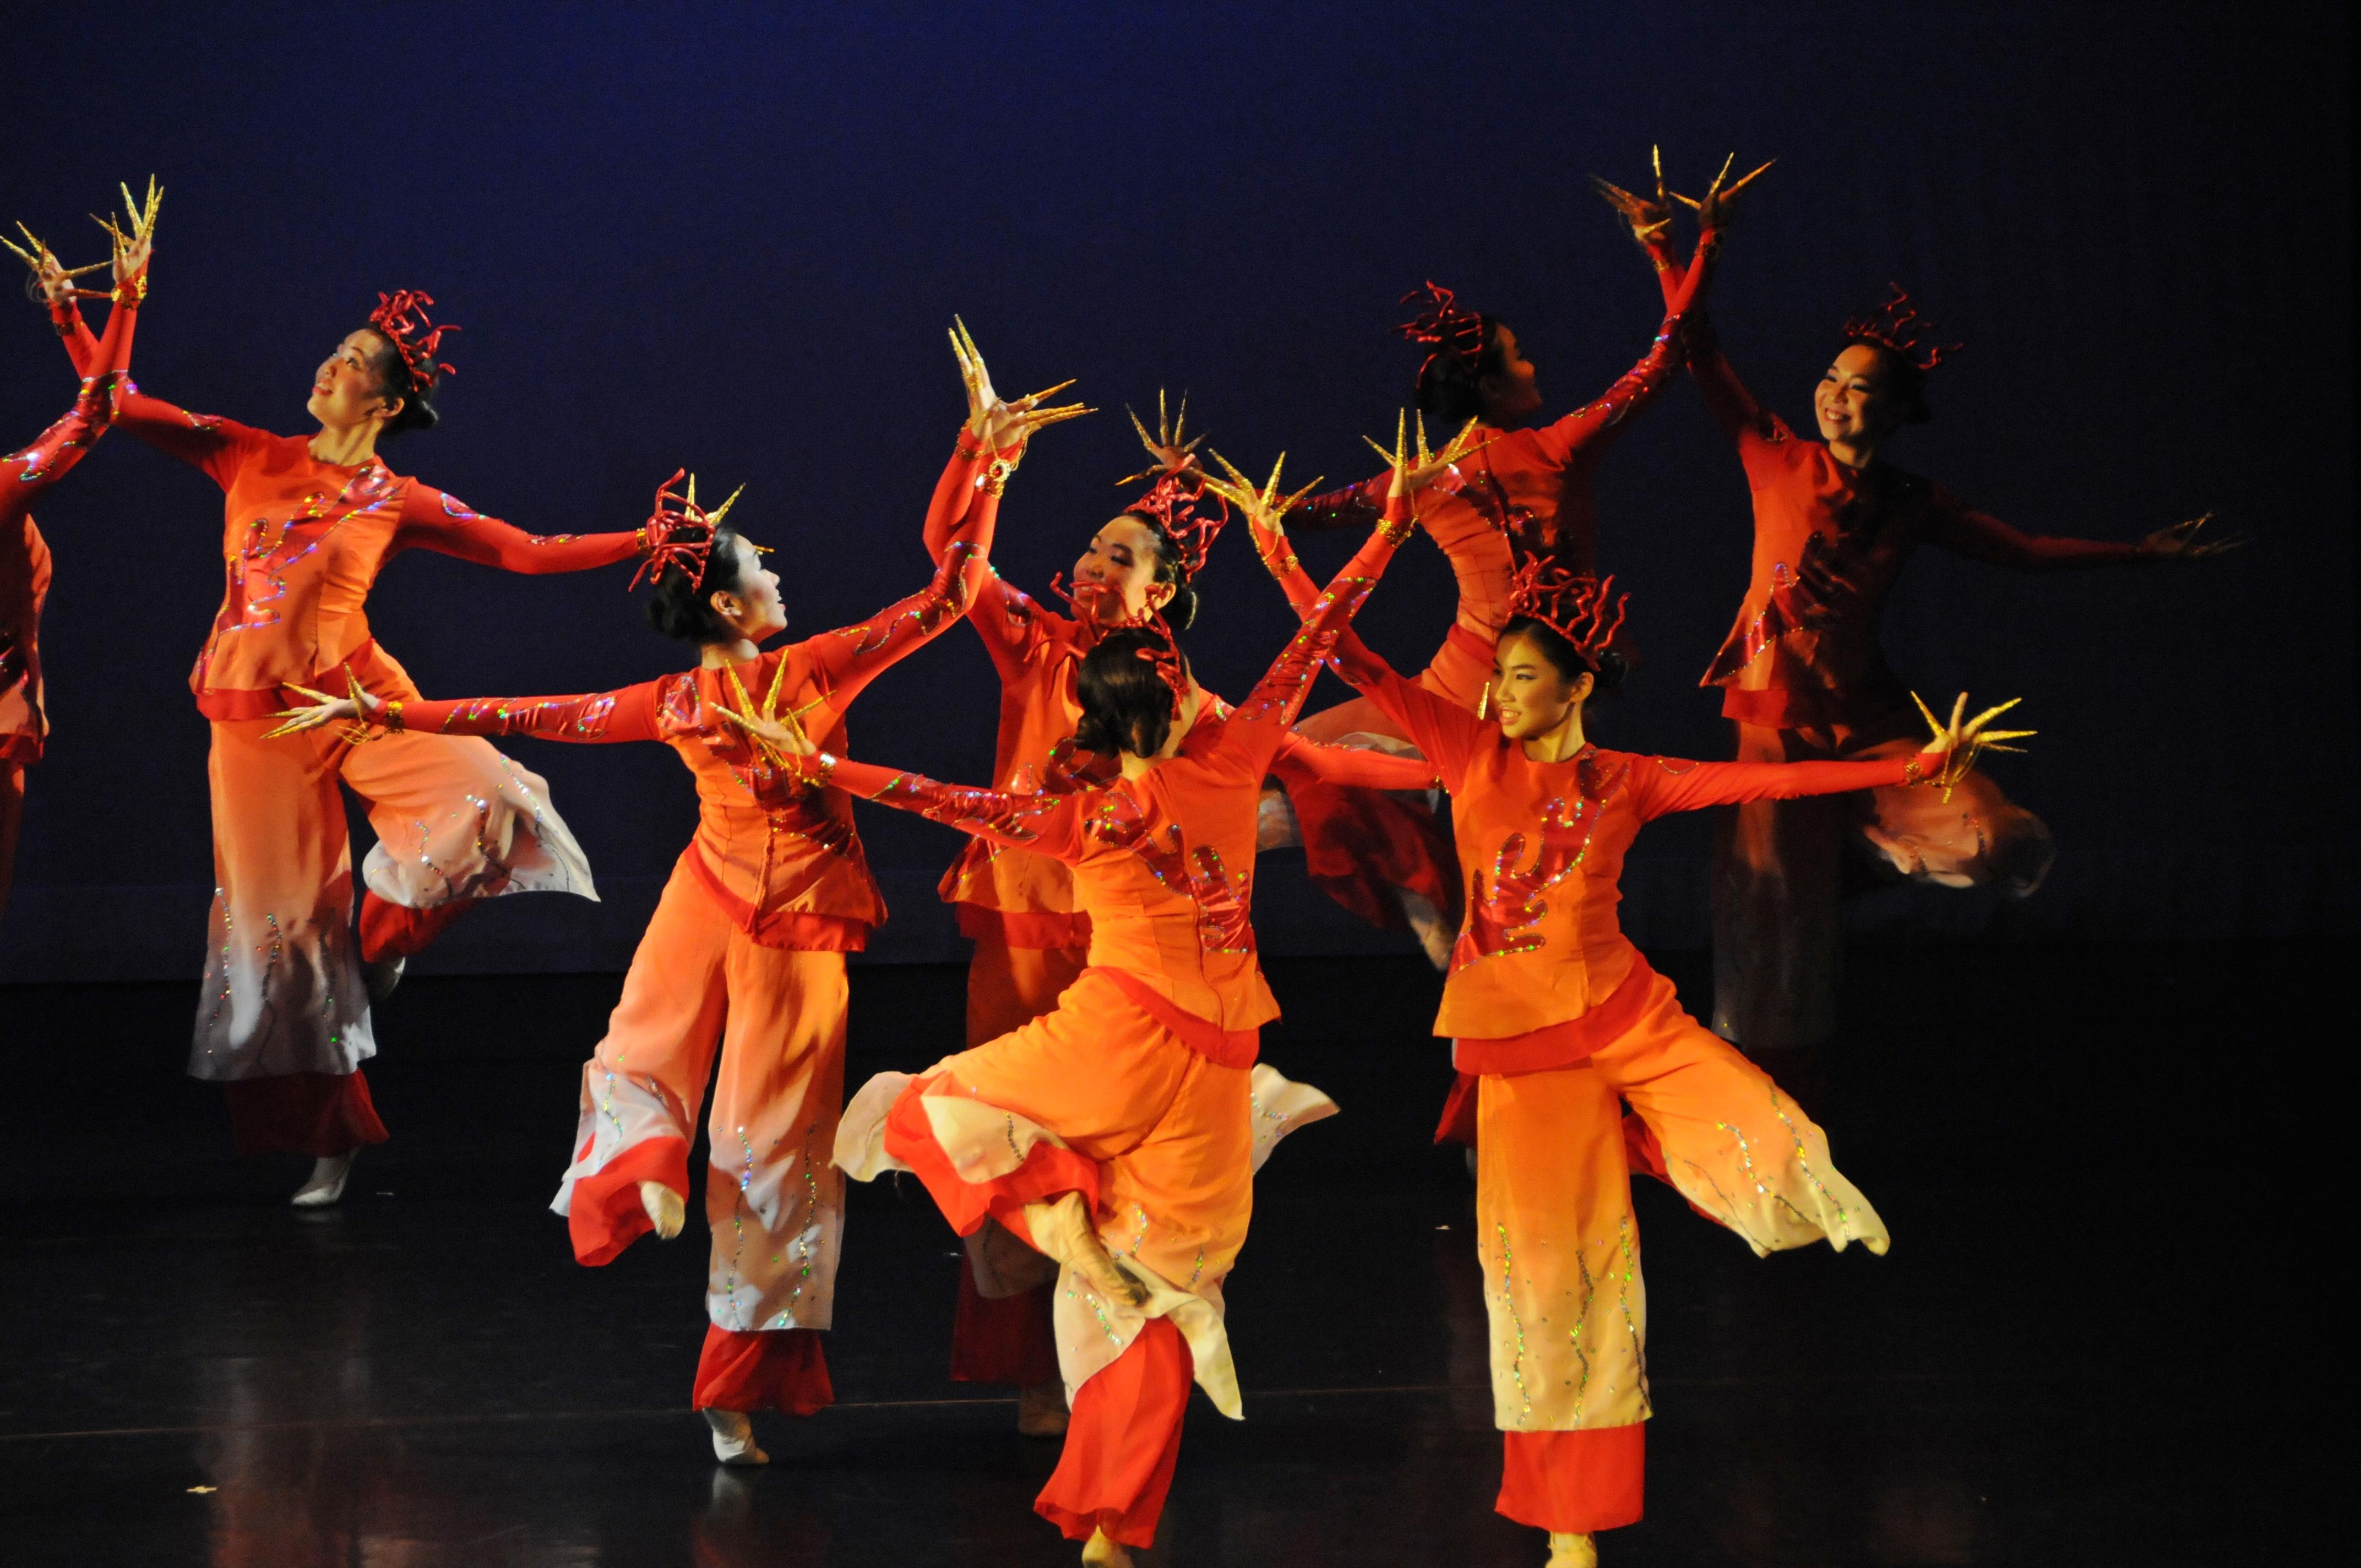 https://hkcchoir.org.hk/sites/default/files/youth_dance_2016wu_yuan_chuan_cheng_4.jpg